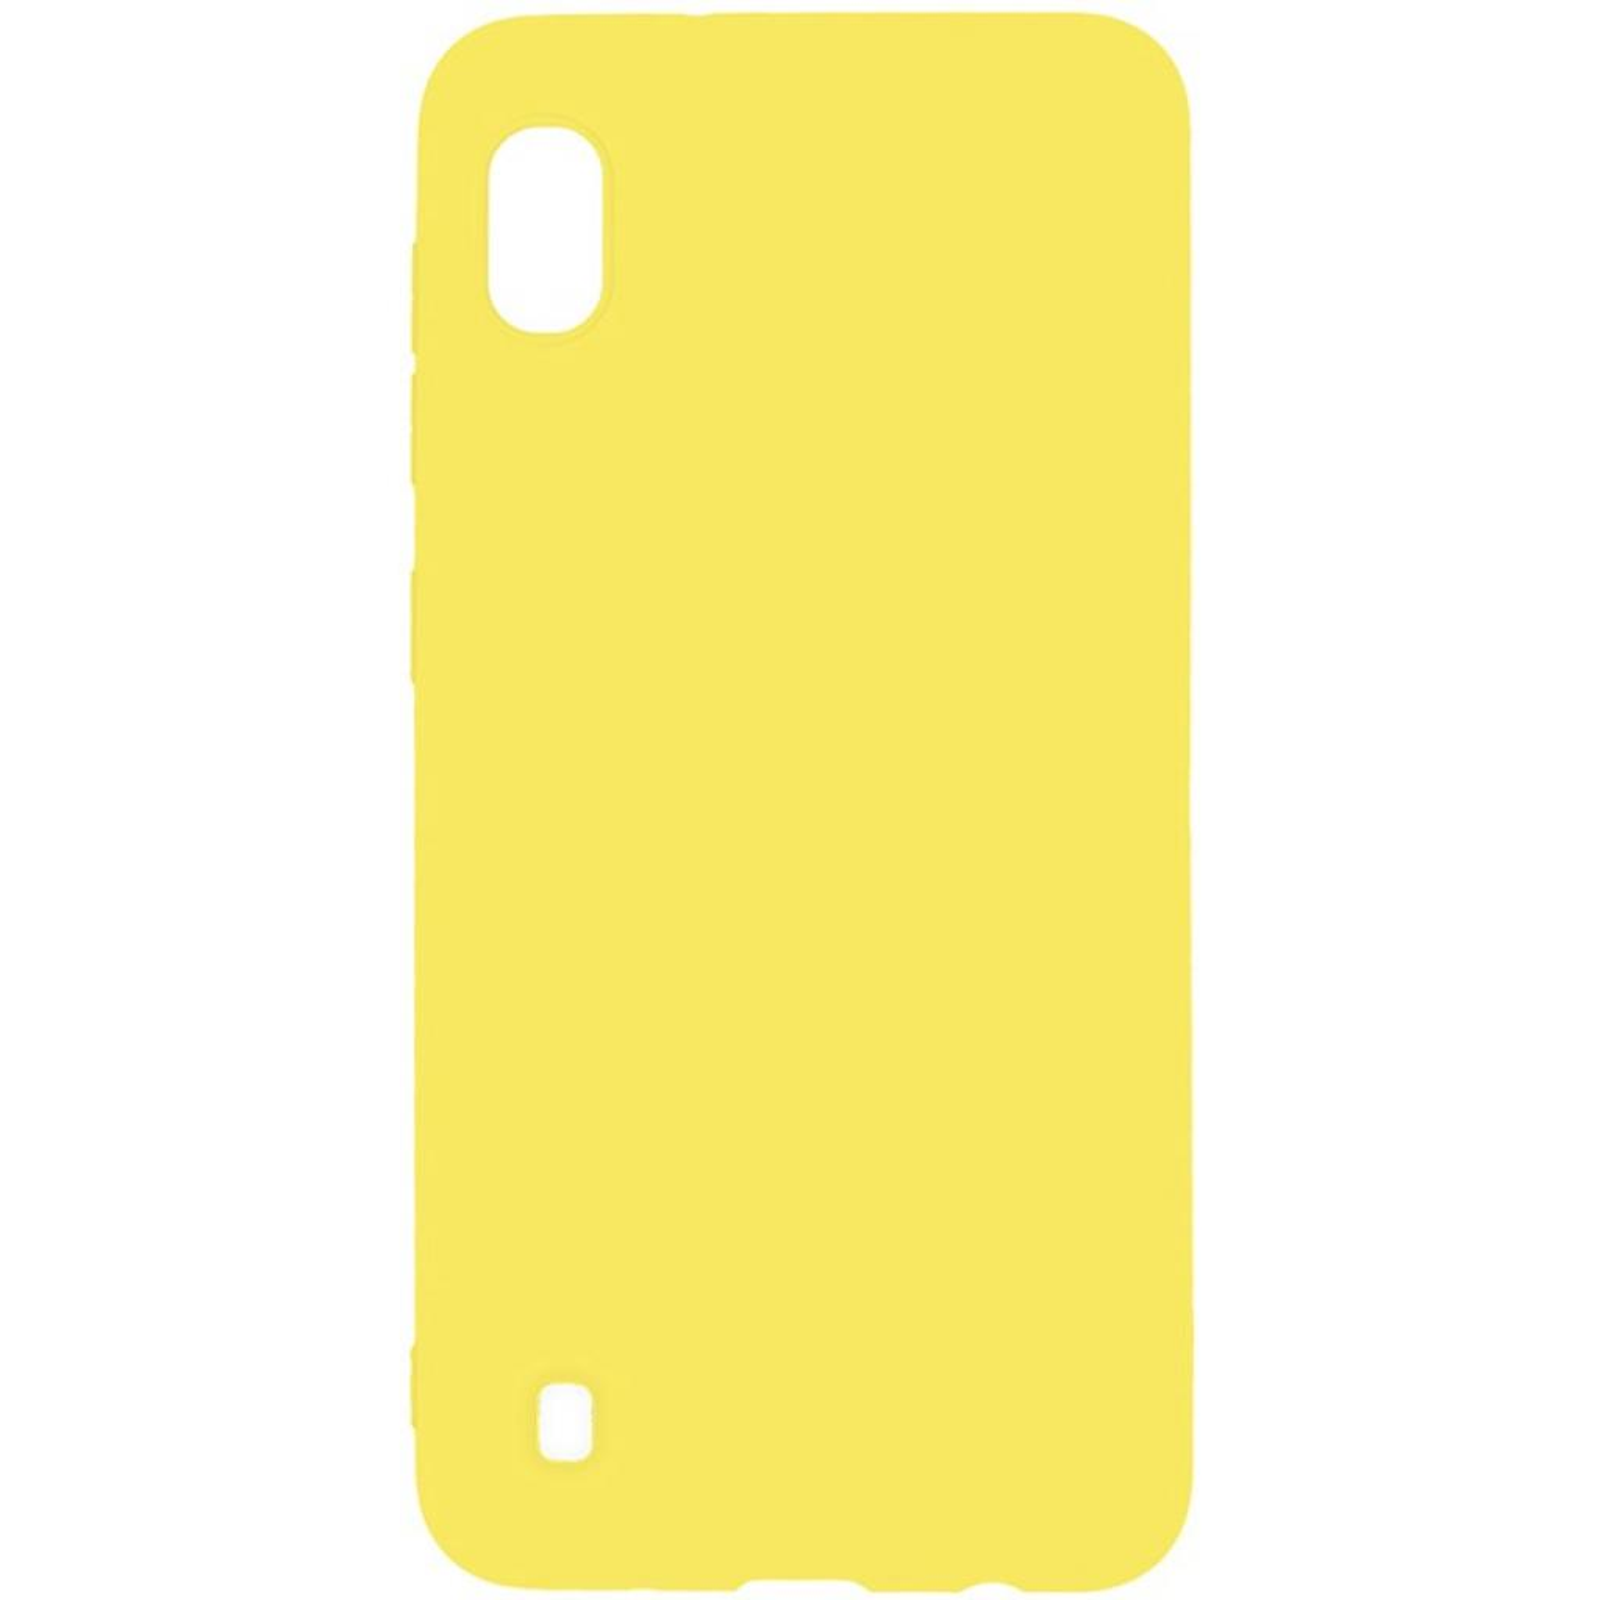 Чехол для моб. телефона Toto 1mm Matt TPU Case Samsung Galaxy A10 Yellow (F_93857)